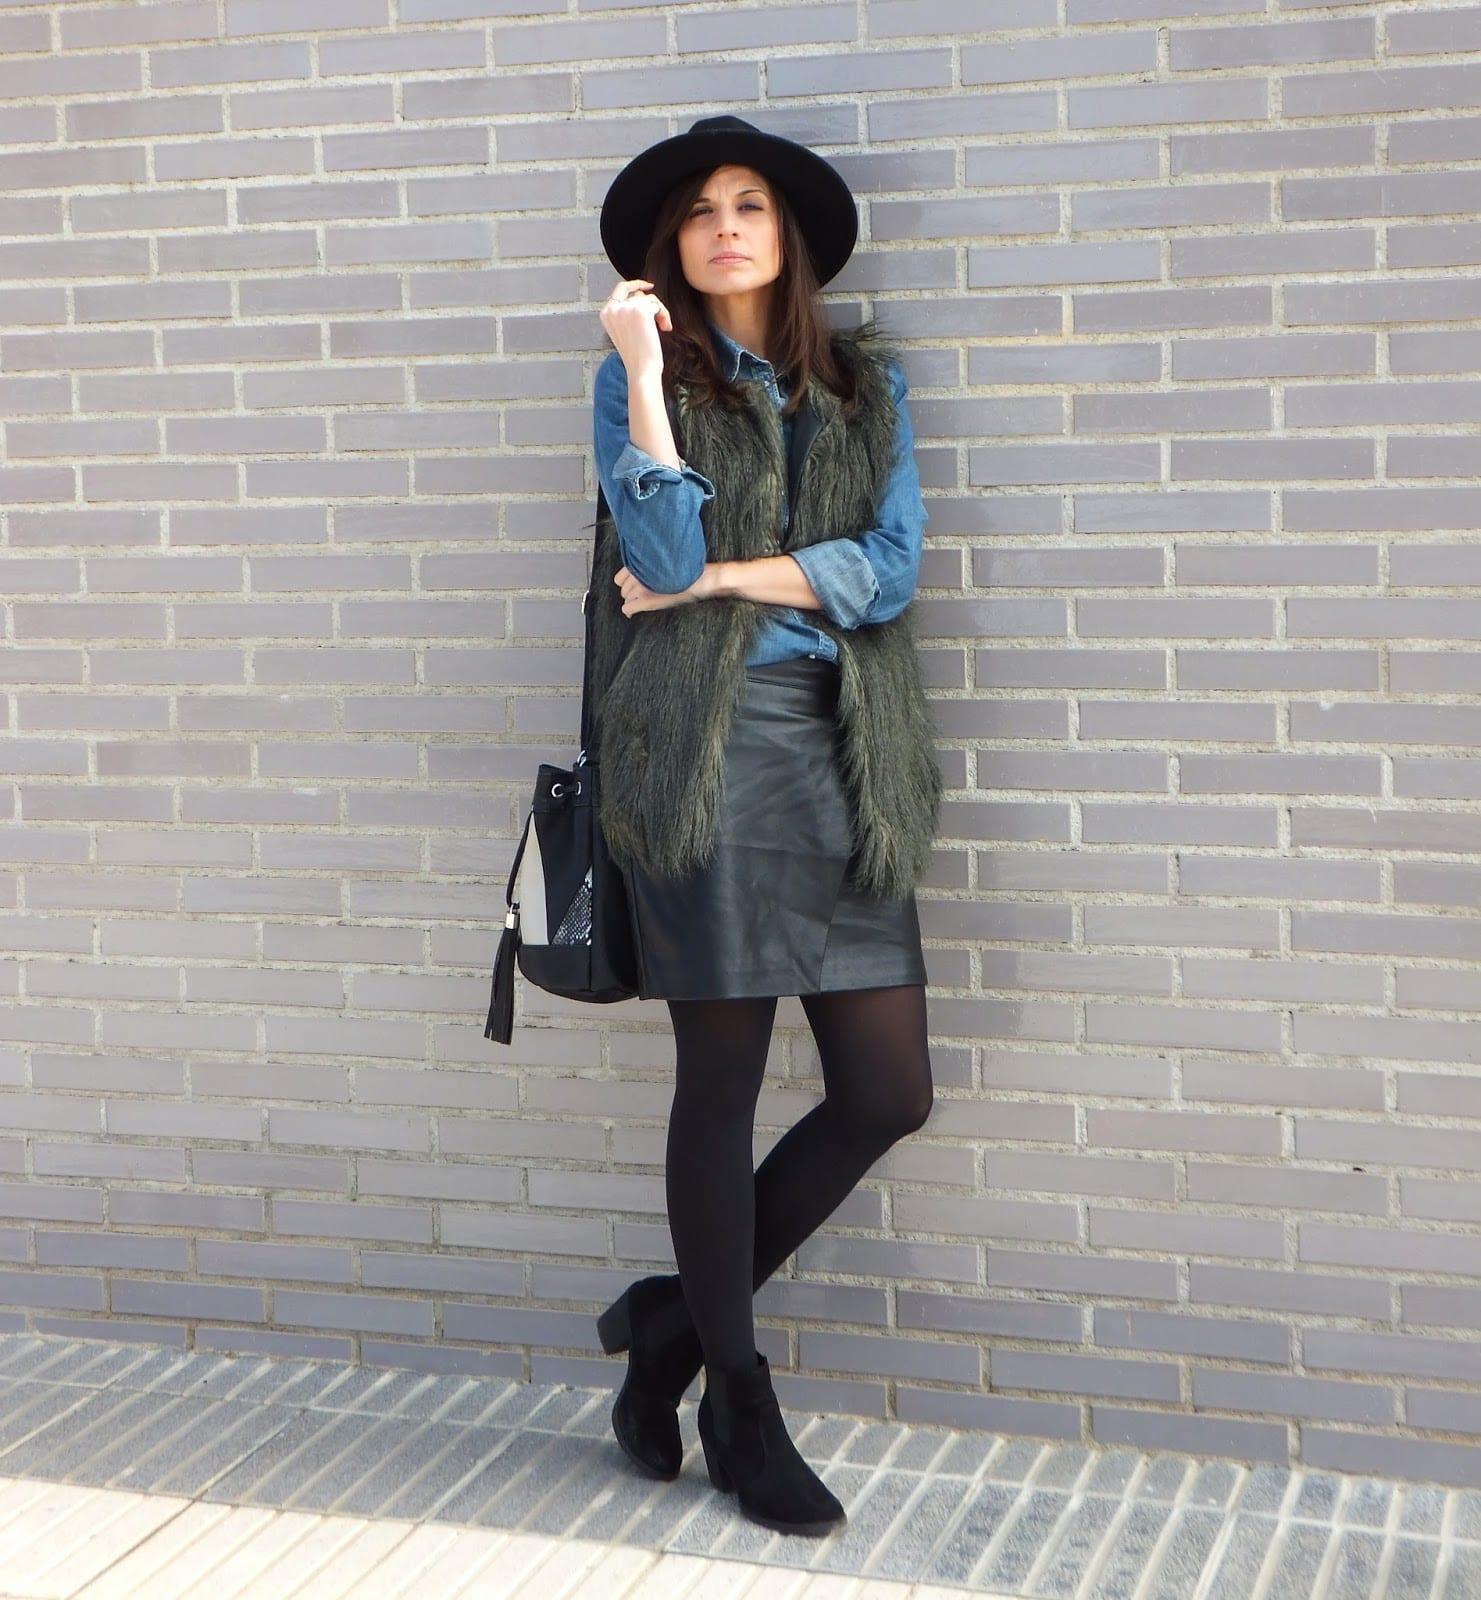 botas chelsea chaleco pelo sombrero fedora bolso saco